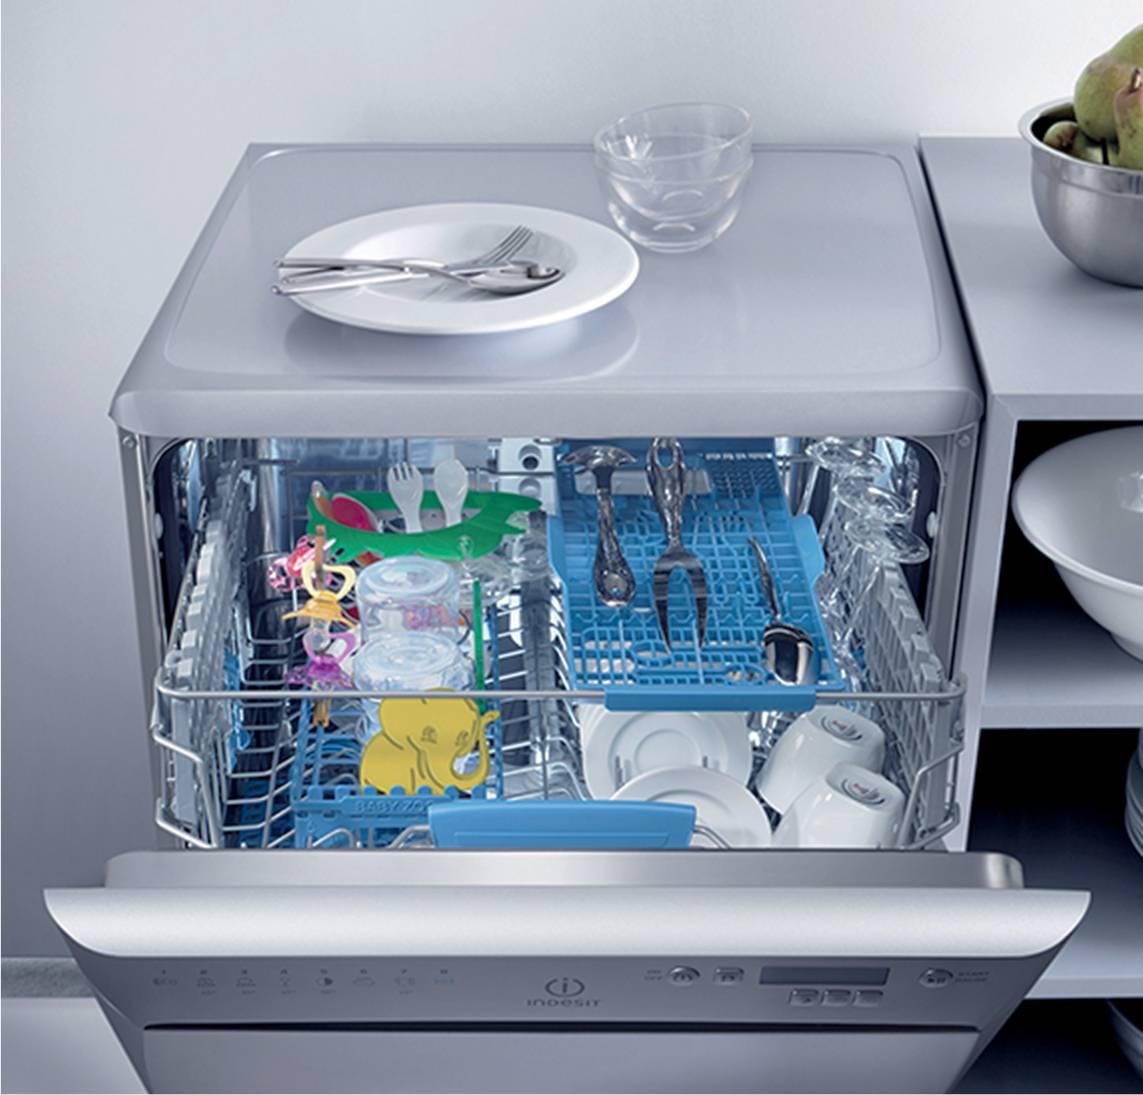 lavastoviglie classe a 14 coperti silenziosa extra indesit indesit elettrodomestici. Black Bedroom Furniture Sets. Home Design Ideas